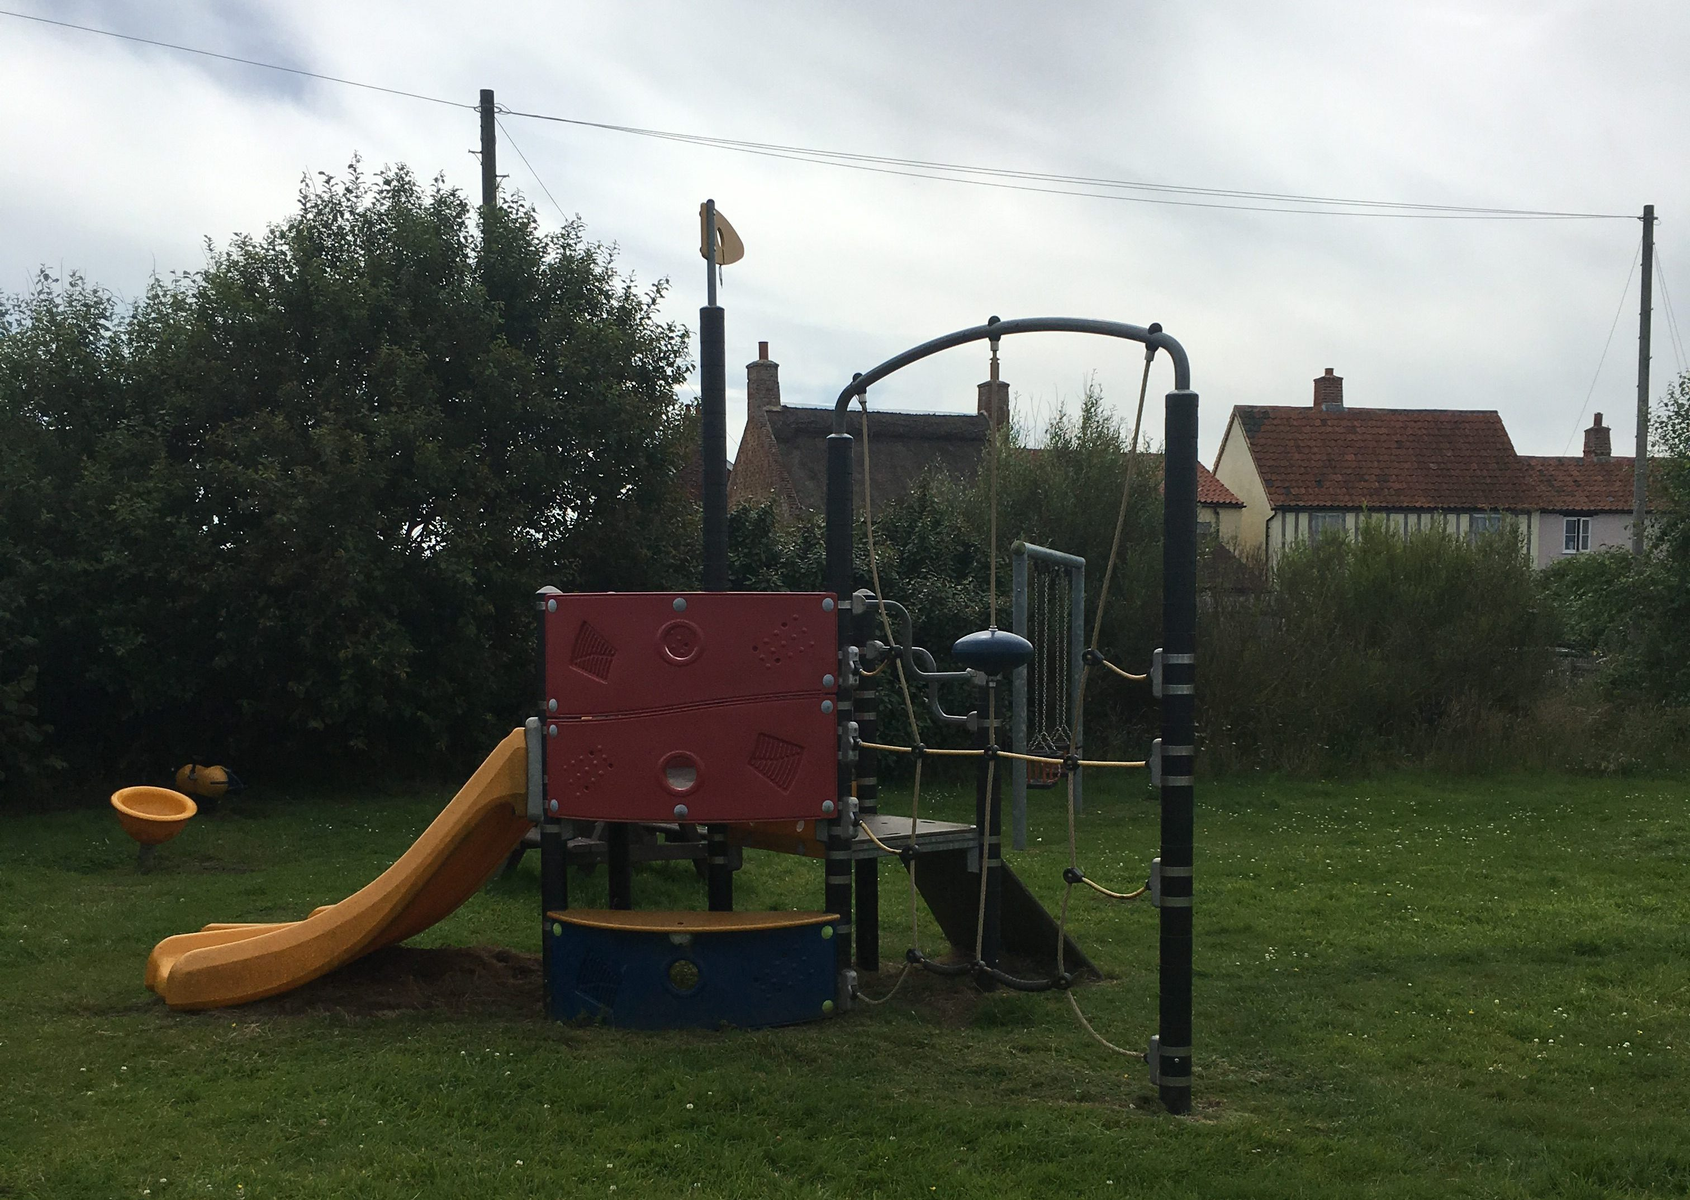 Sea Palling Playground